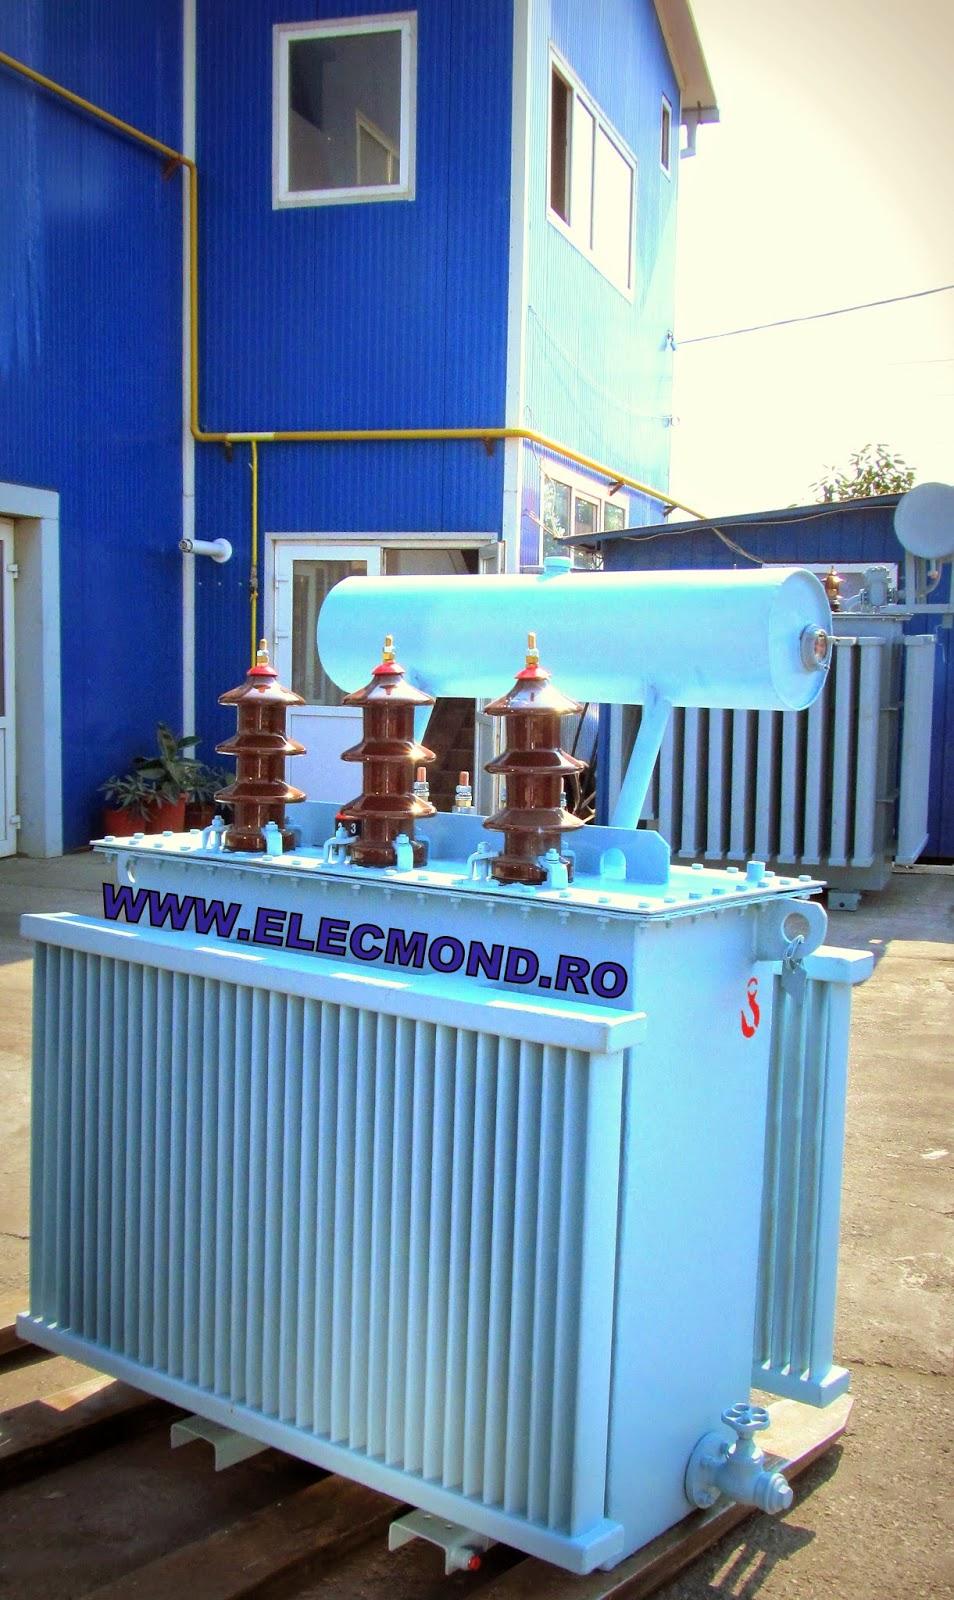 transformator , transformatoare , transformatoare din stoc , elecmond , elecmond blog , transformatoare electrice , transformatoare de putere , reparatii transformatoare , transformator 250 kVA